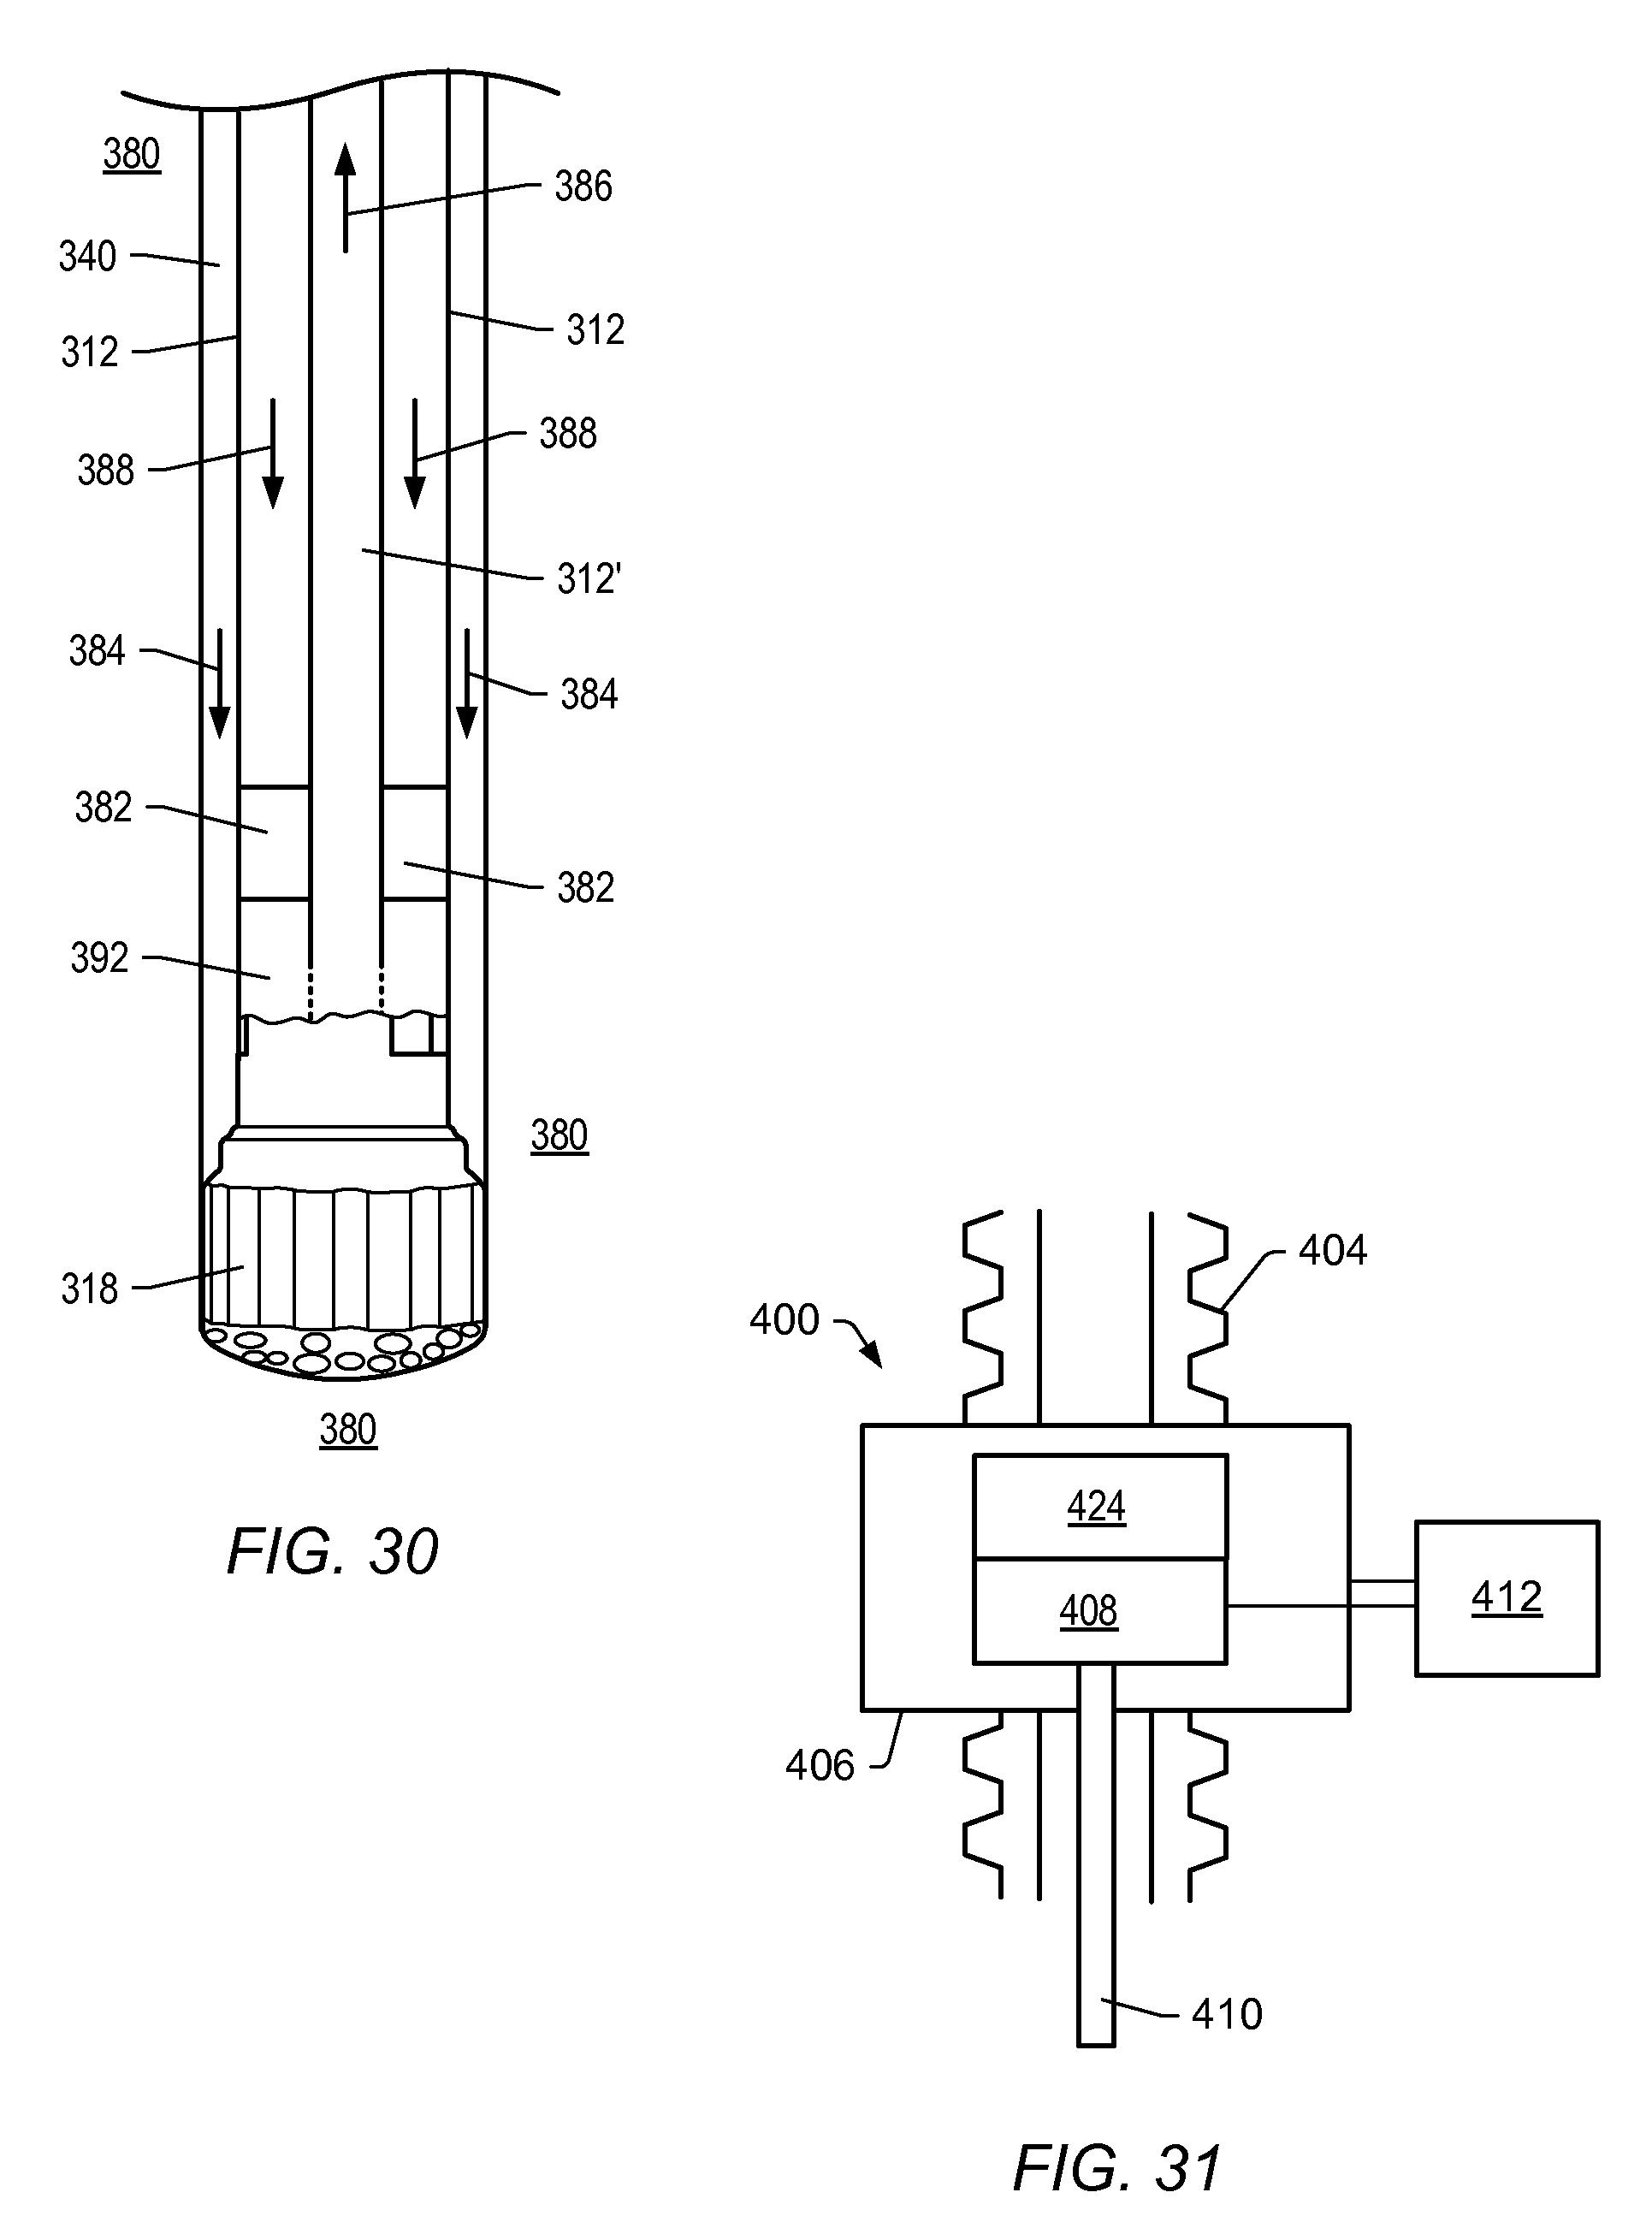 Patent US 9,528,322 B2